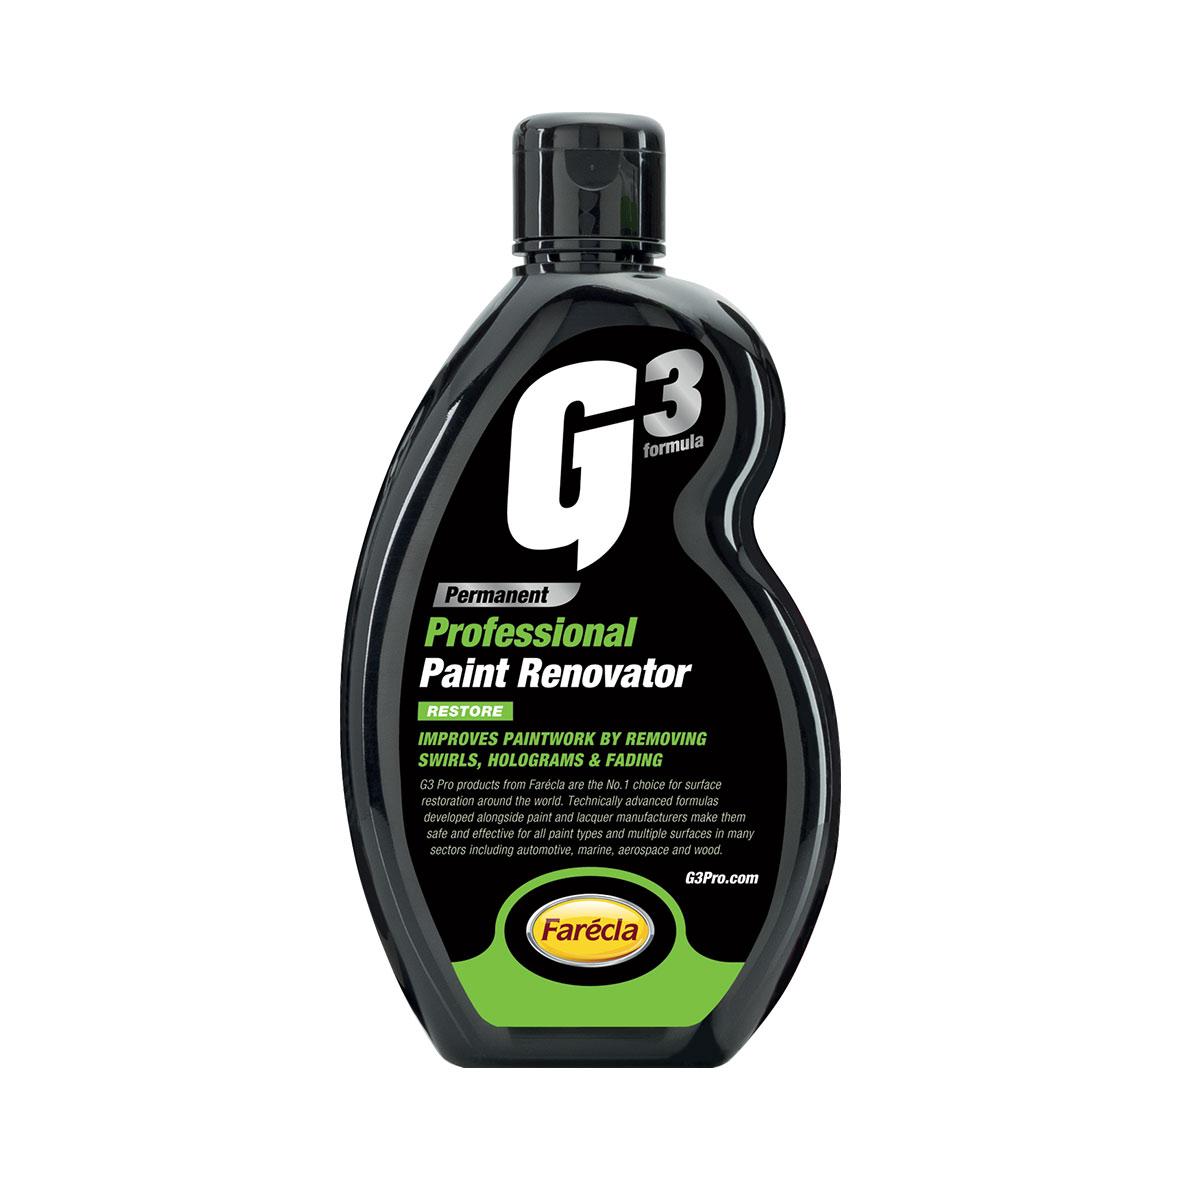 G3 Professional Paint Renovator